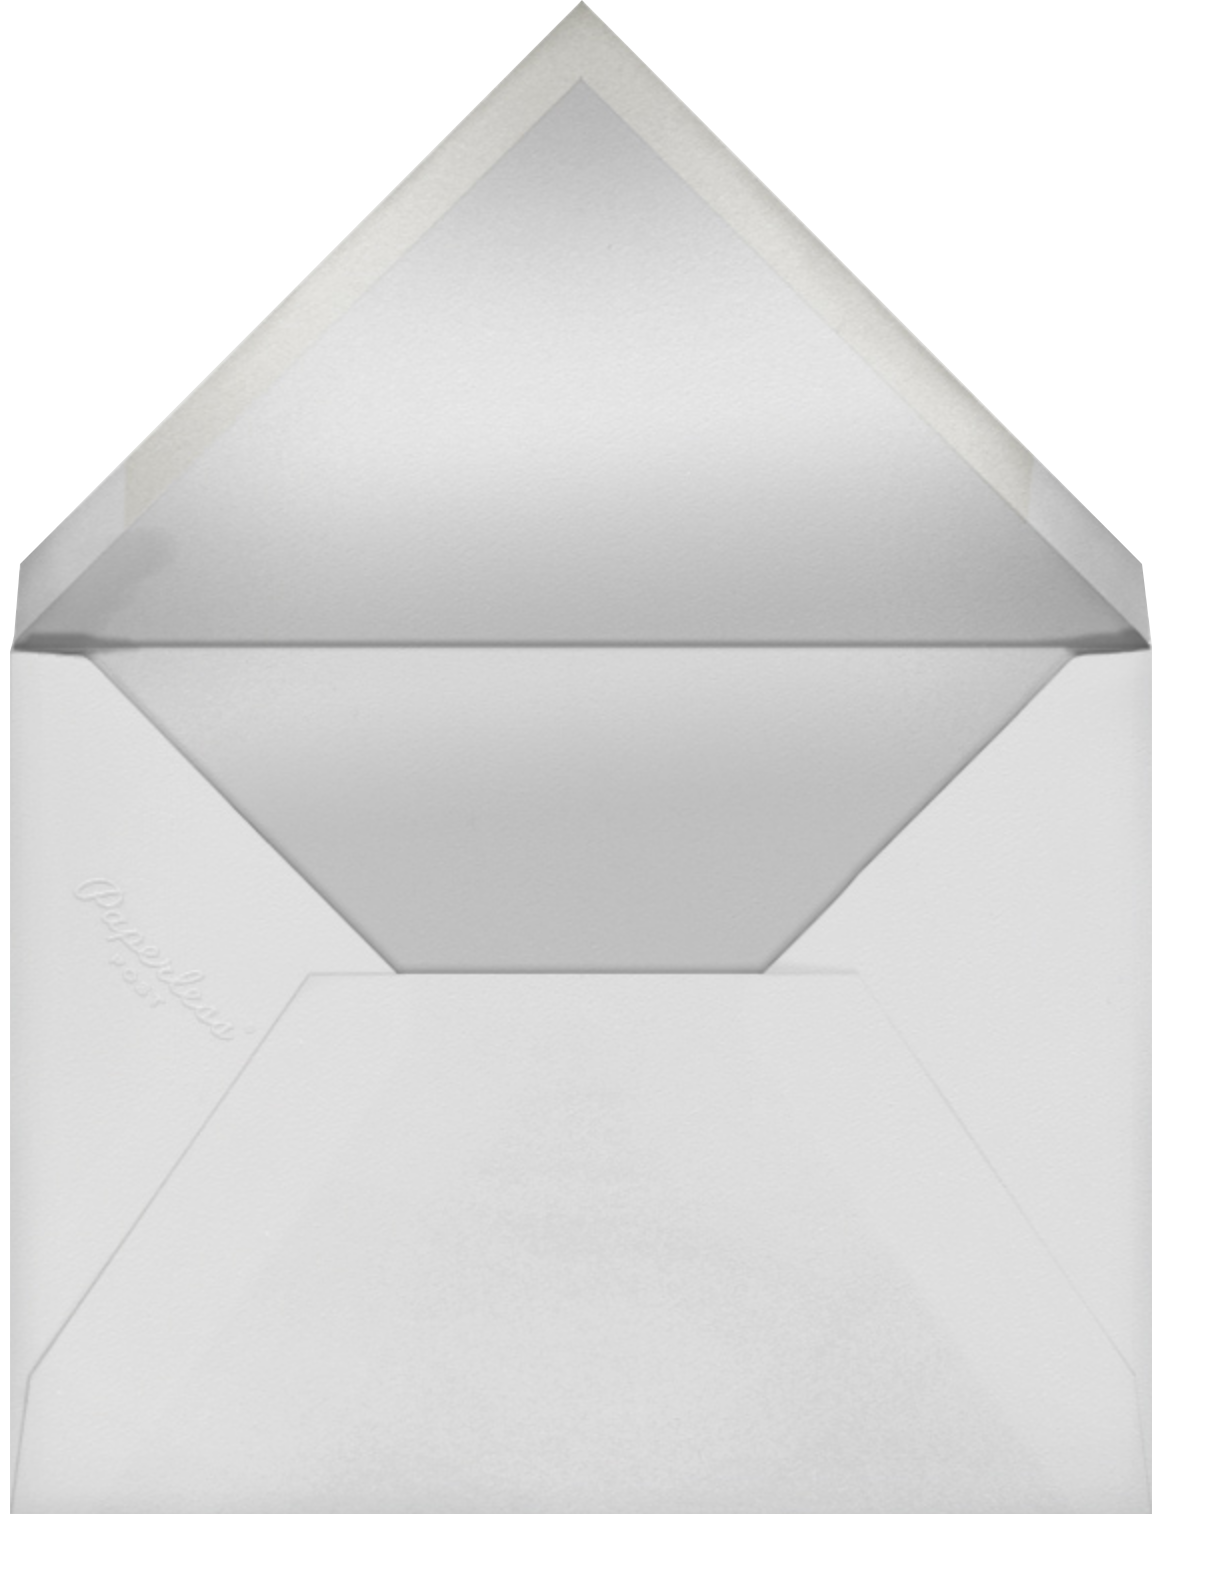 Paris Skyline View (Menu) - Black/White - Paperless Post - Menus - envelope back